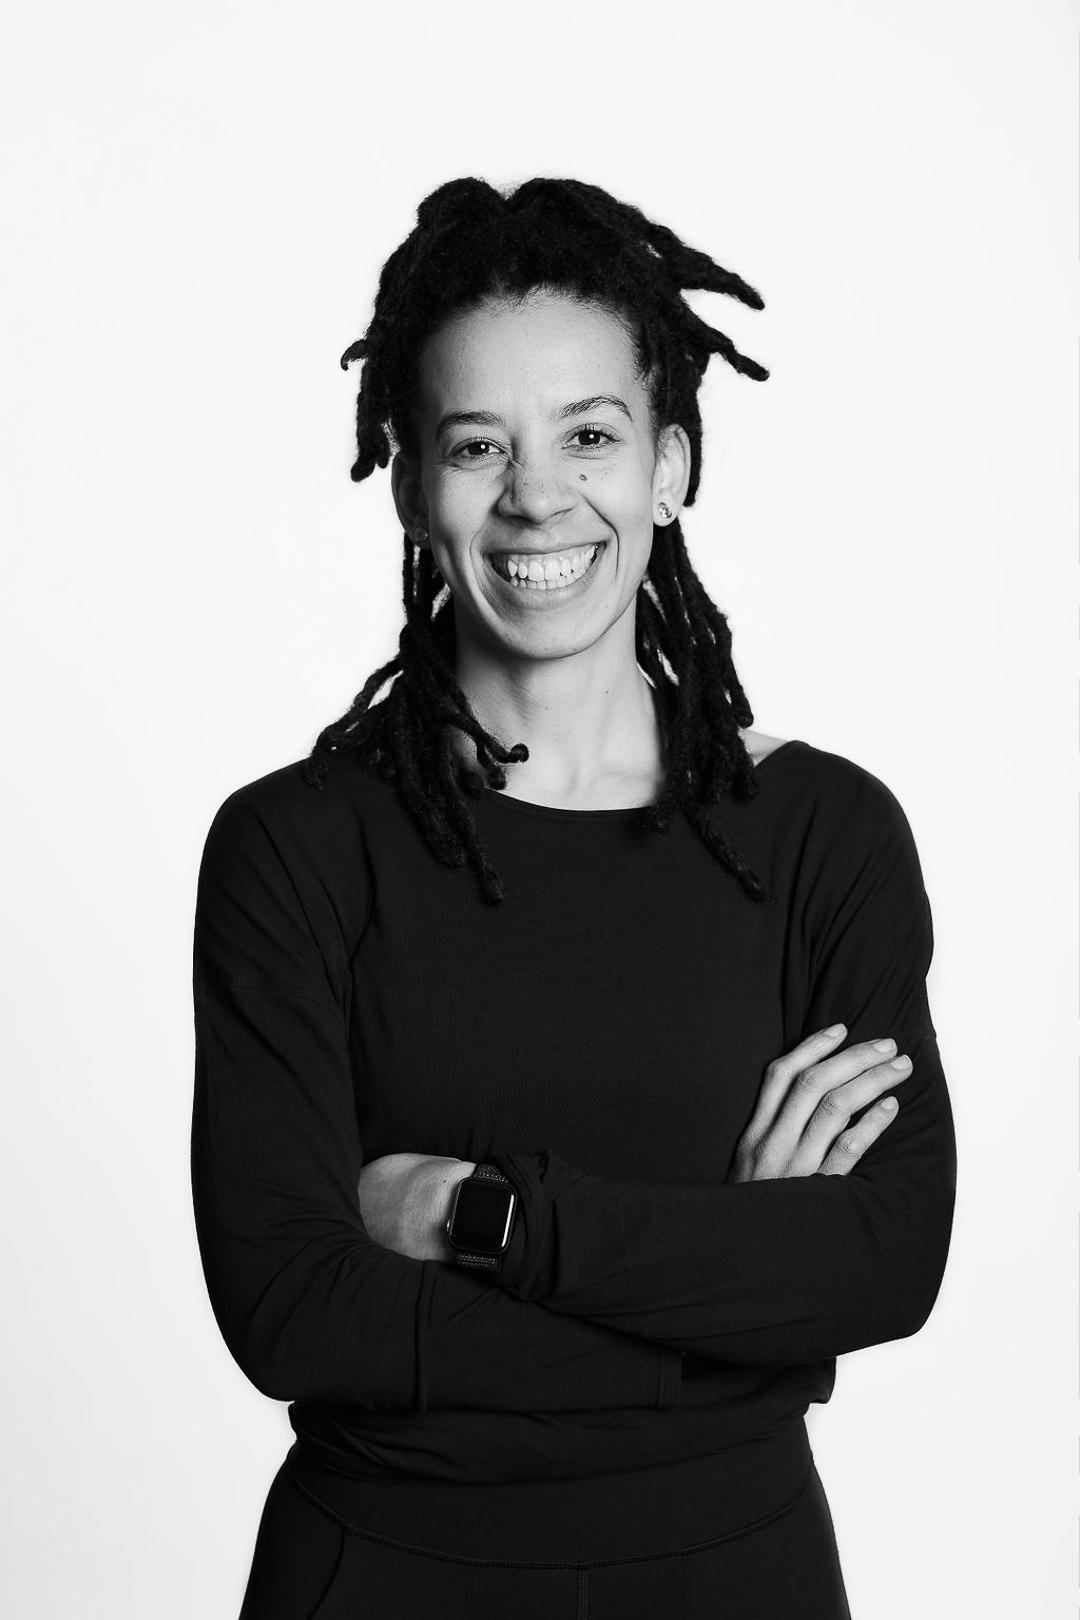 0514_1-3